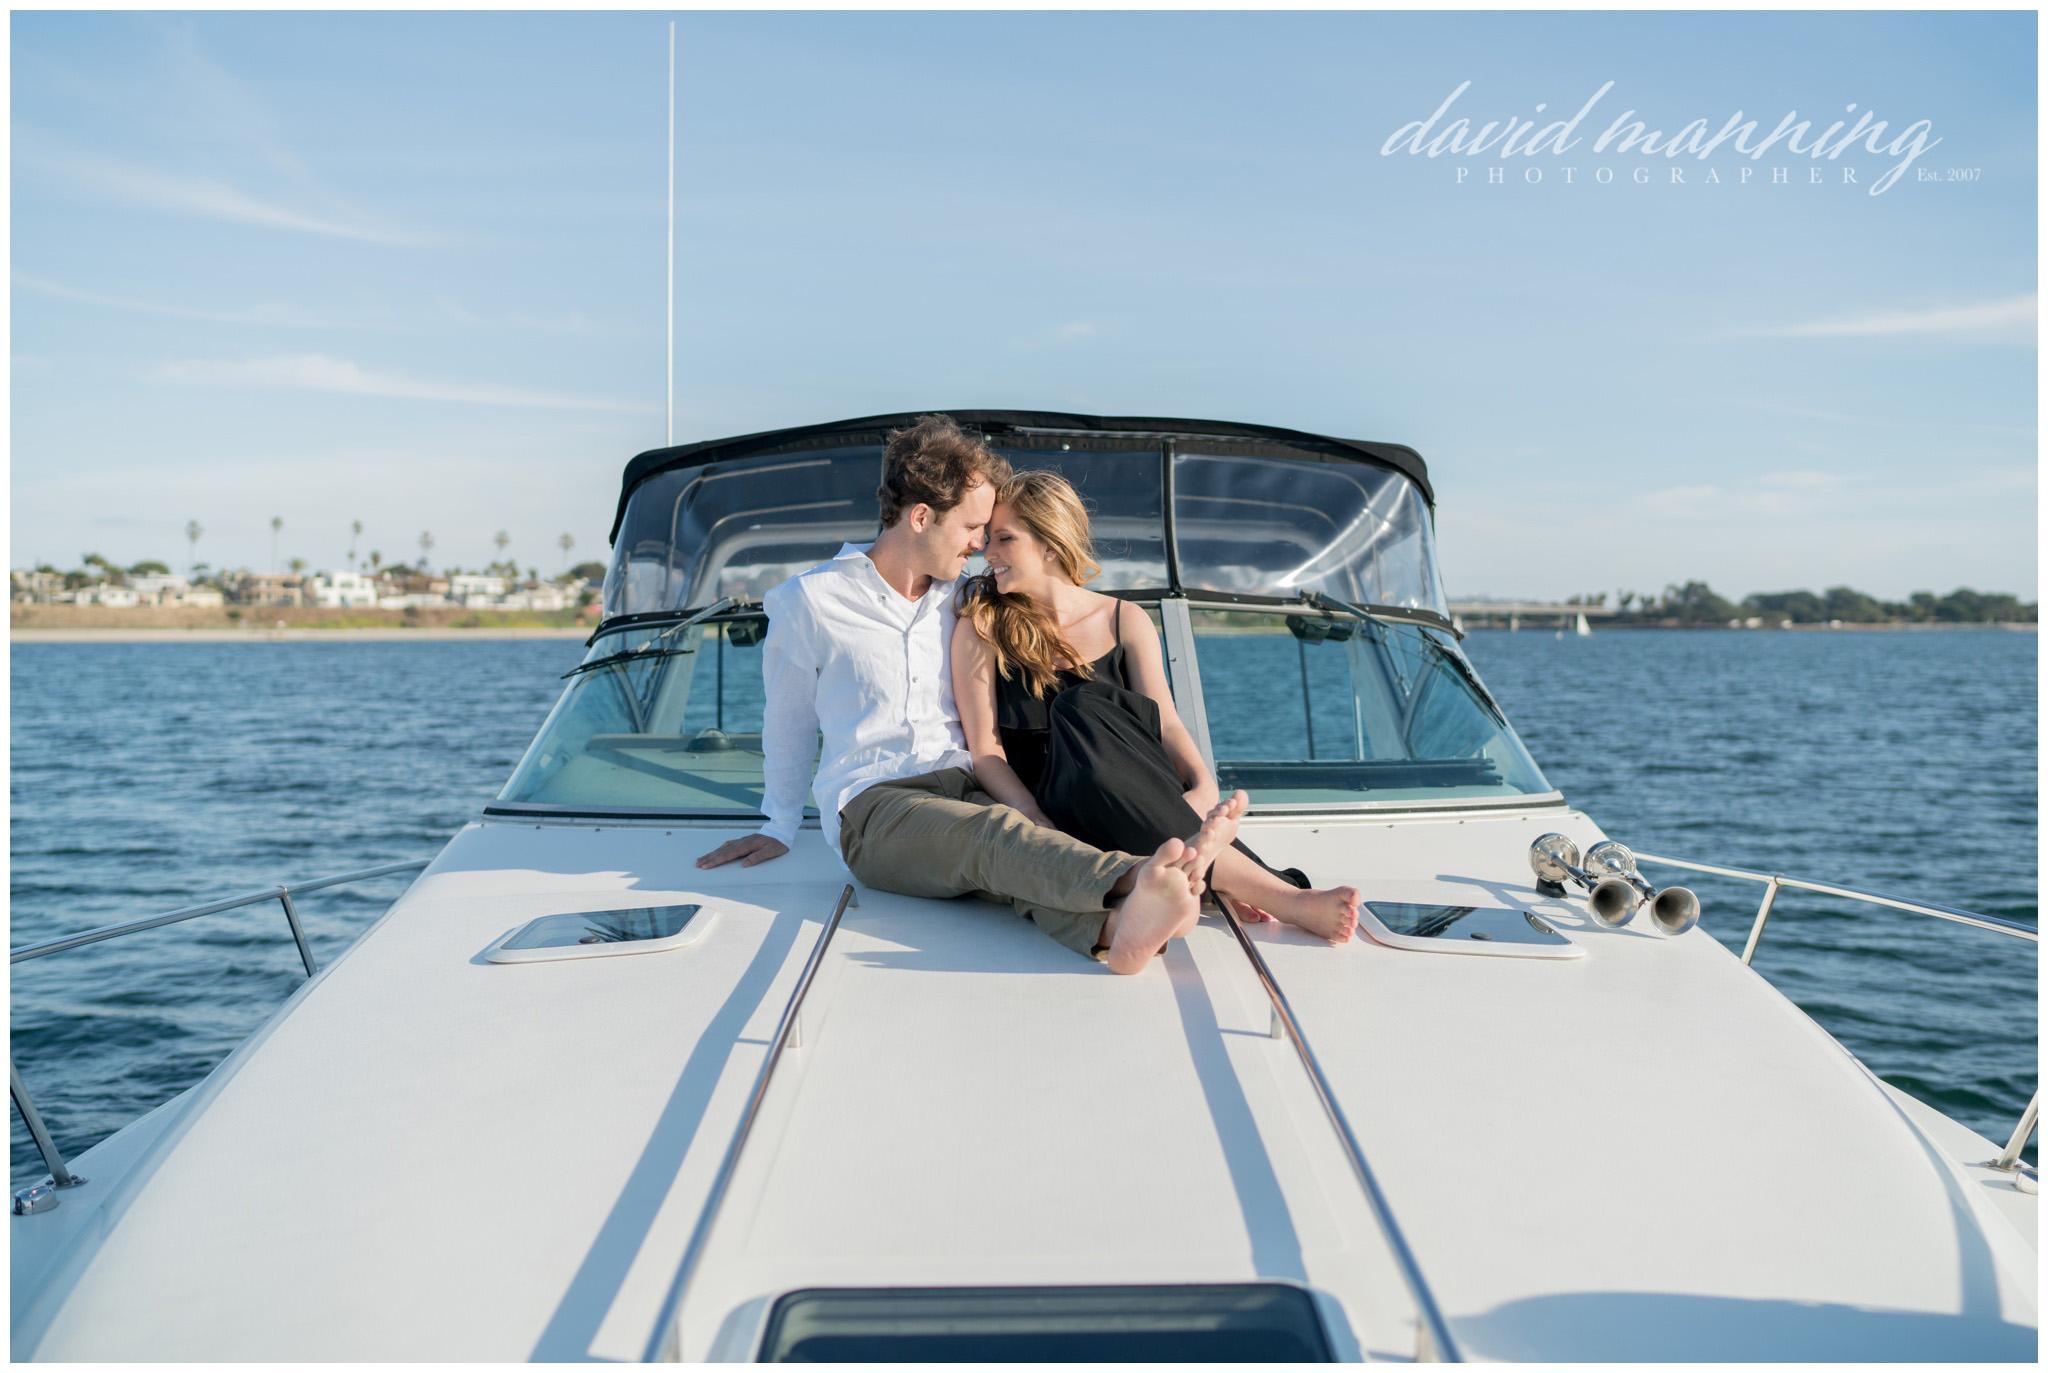 Alyssa-Taylor-Engagement-David-Manning-Photographer-0069.JPG